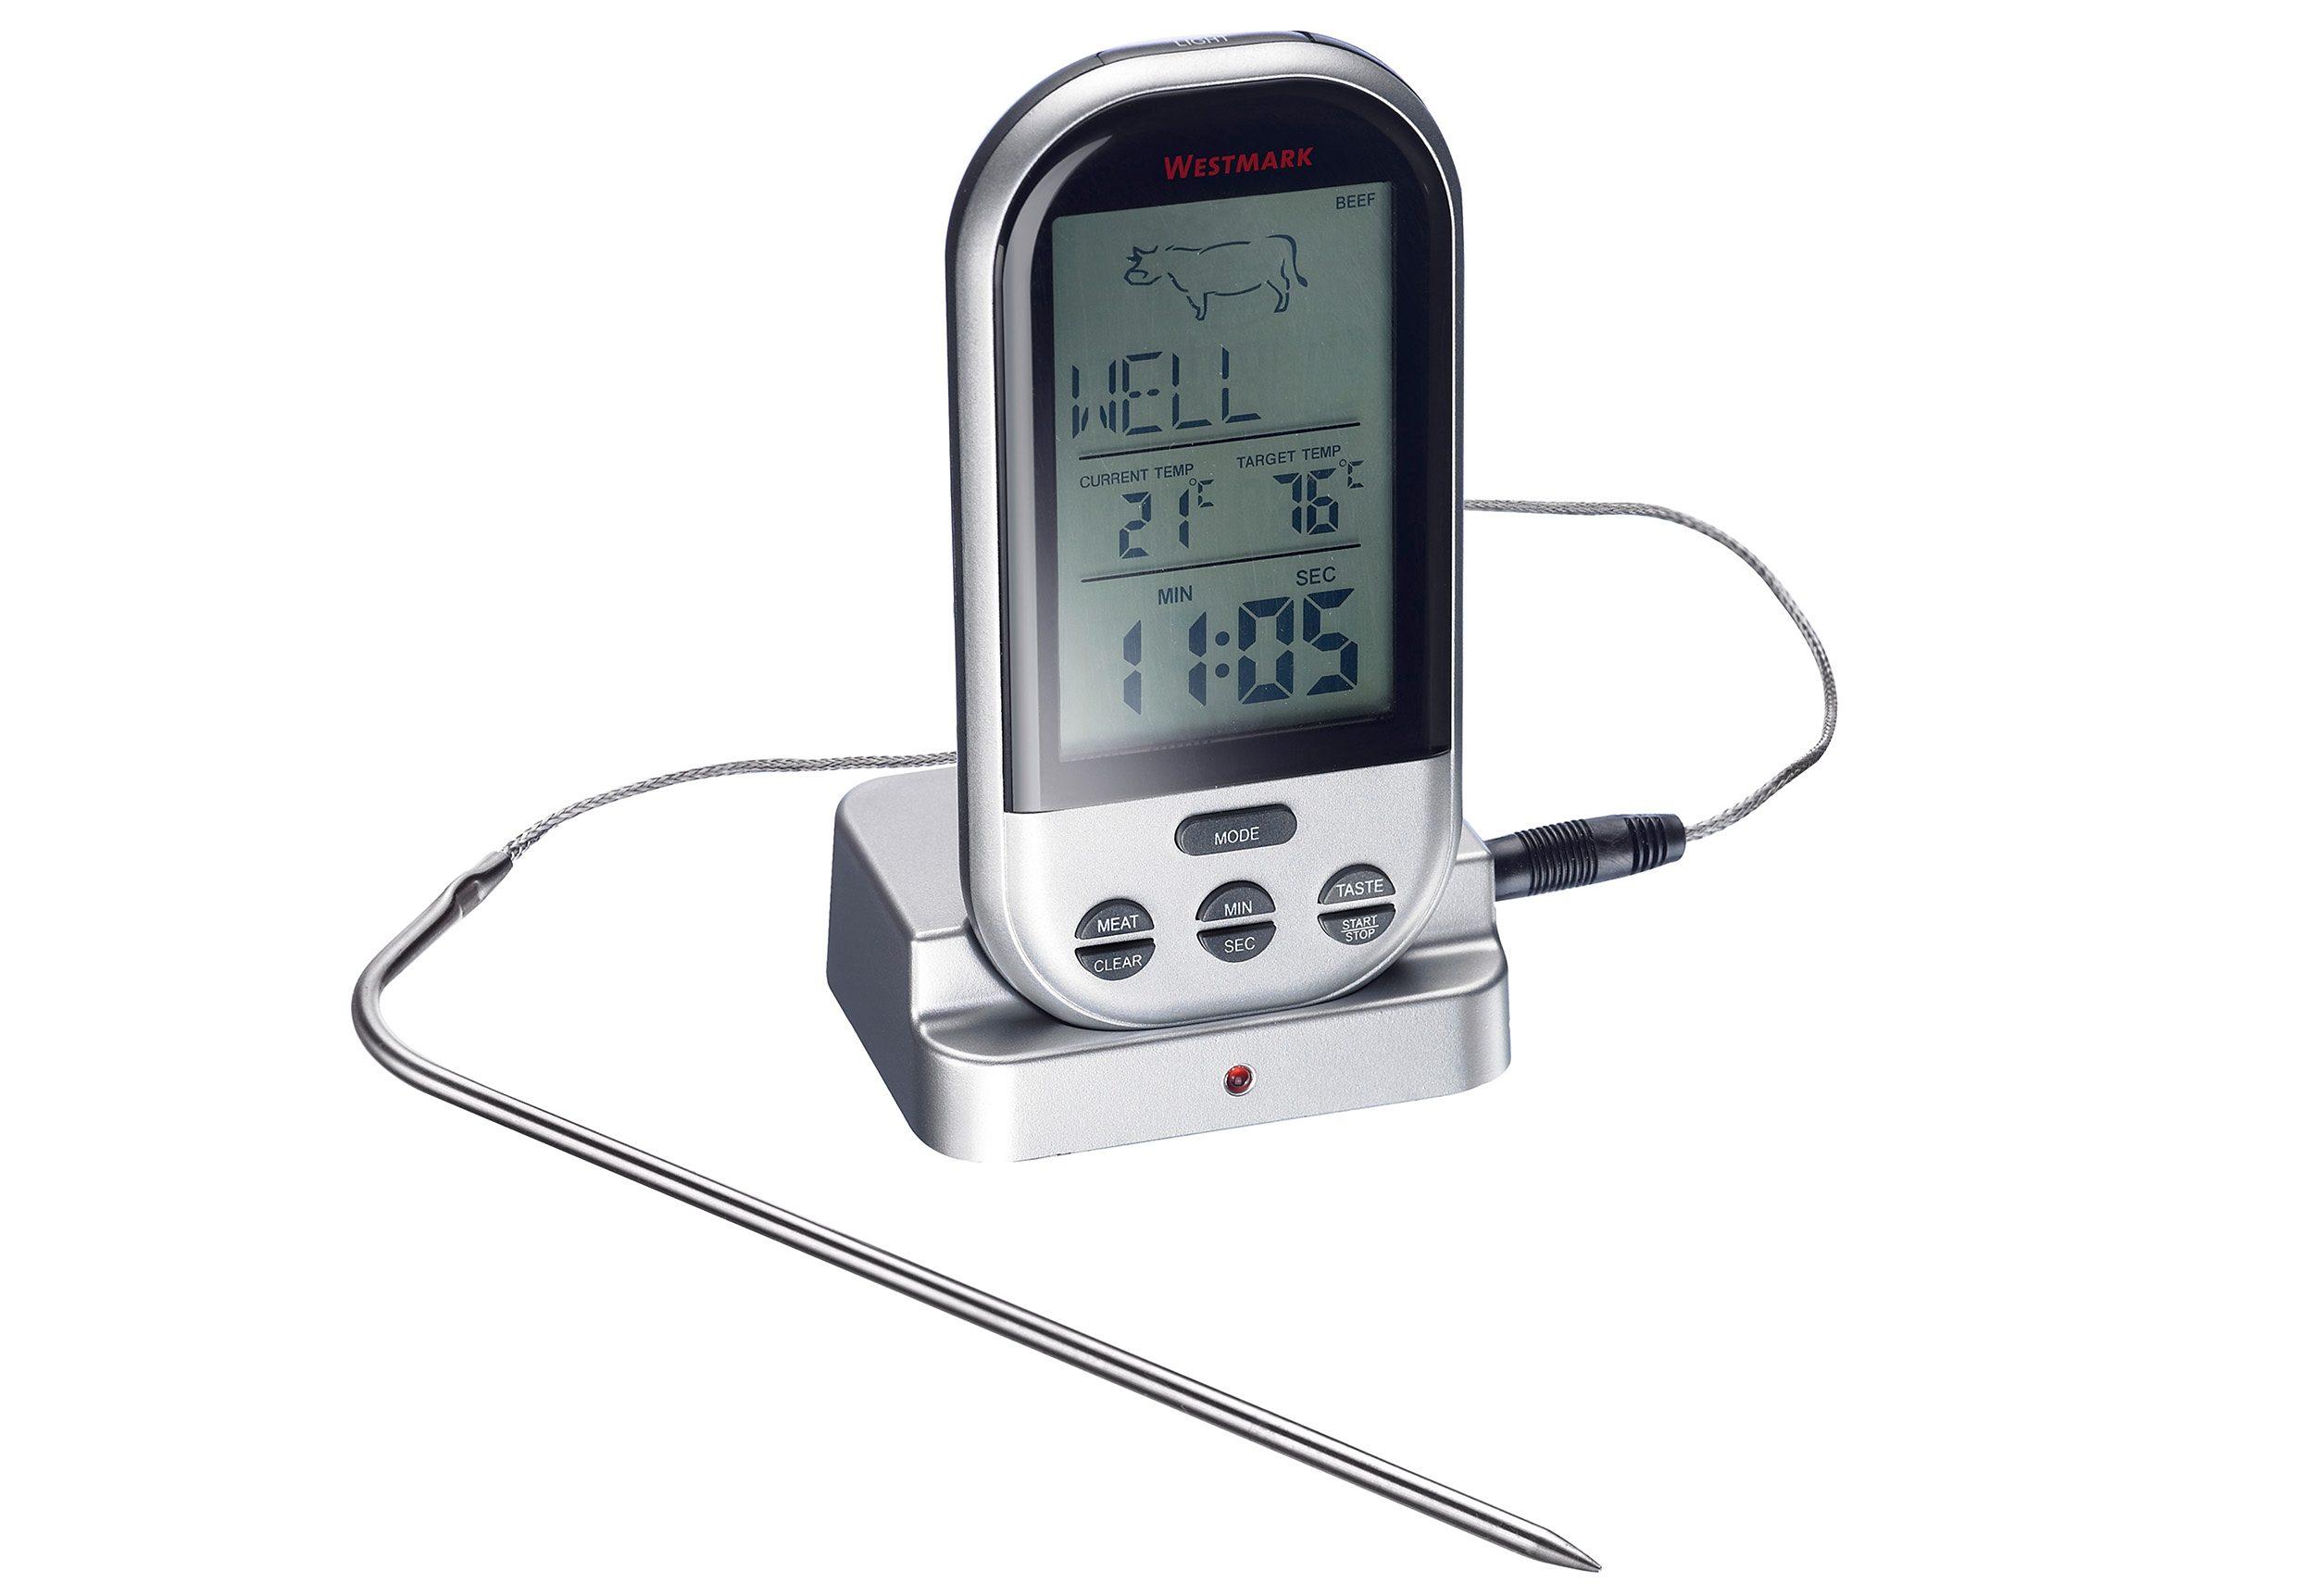 Kühlschrank Thermometer Funk : Funk thermometer zeppy